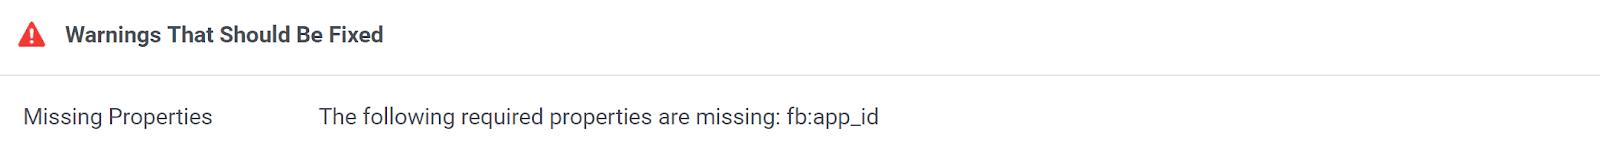 missing fb app id